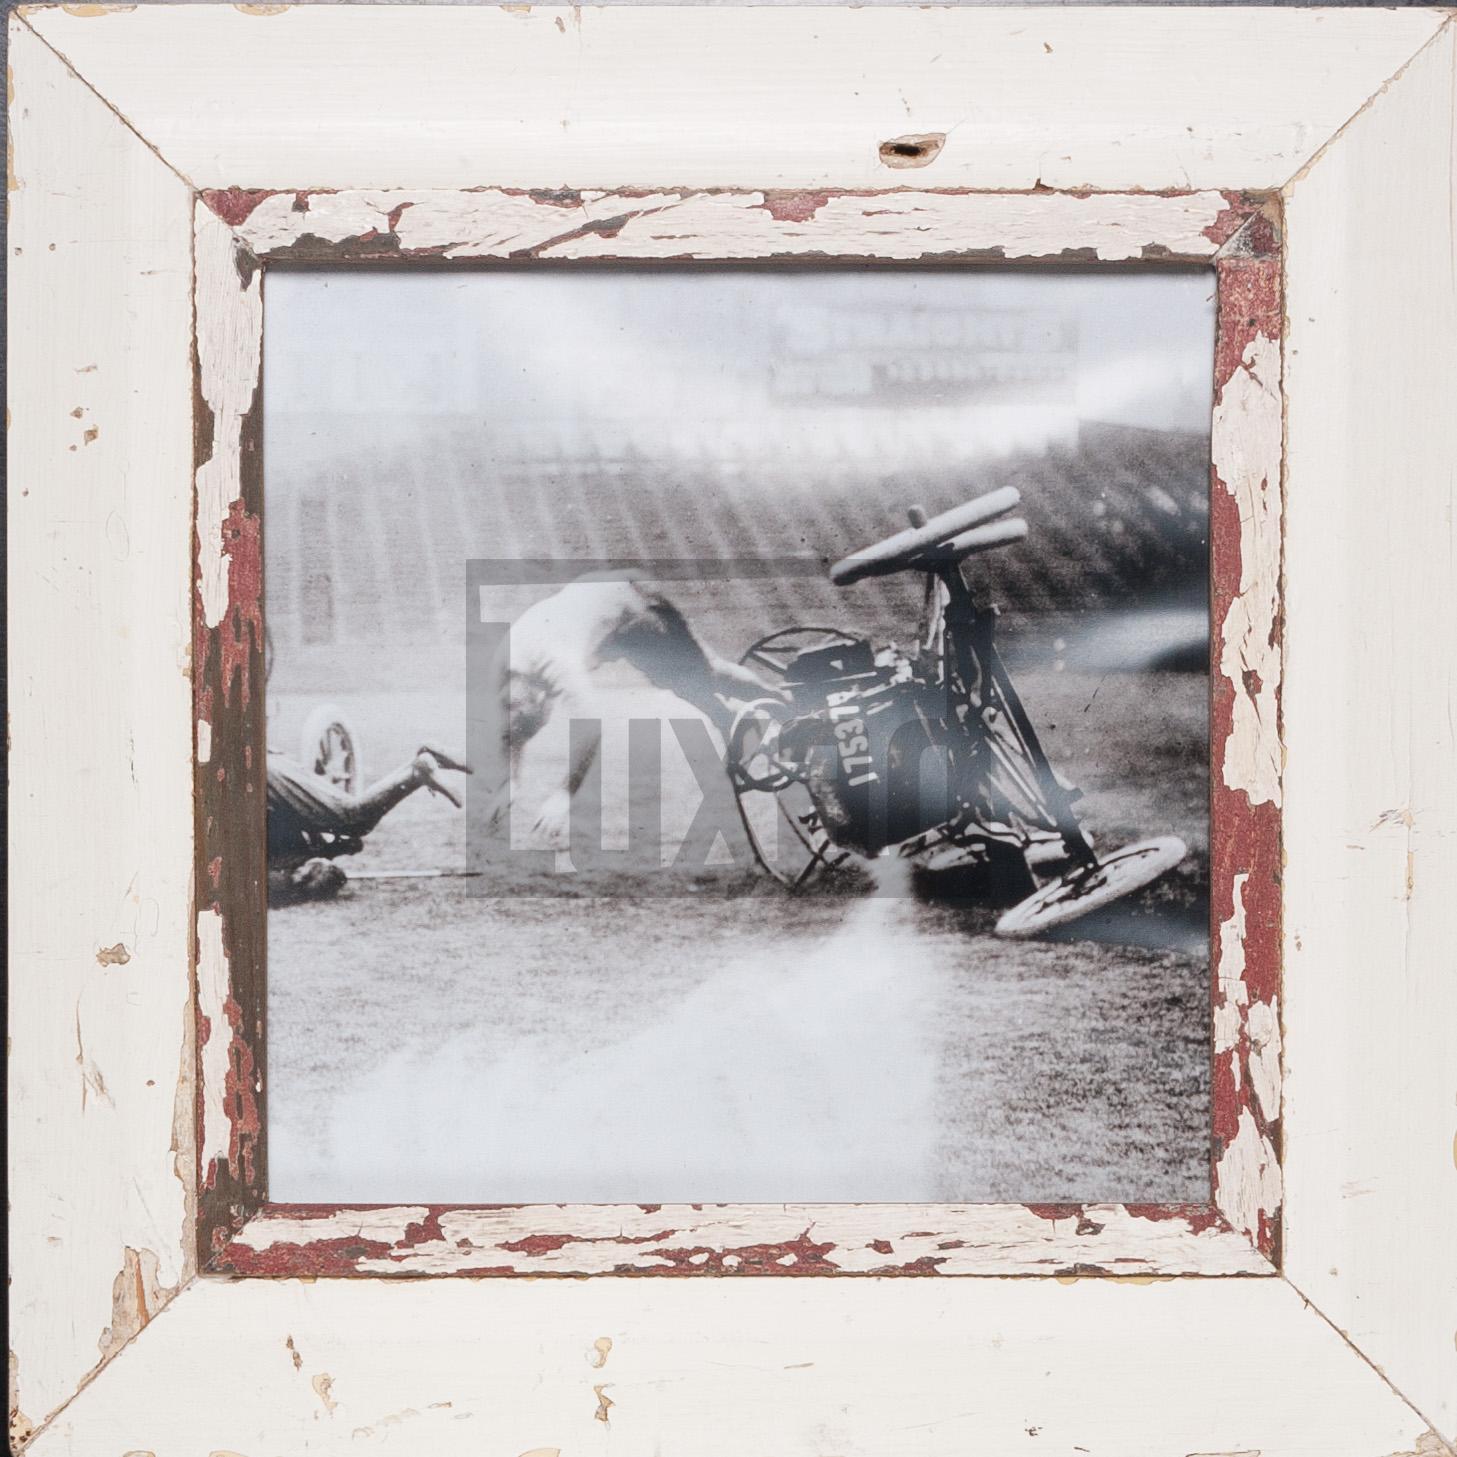 Quadratischer Altholz-Fotorahmen für quadratische 29,7 x 29,7 cm